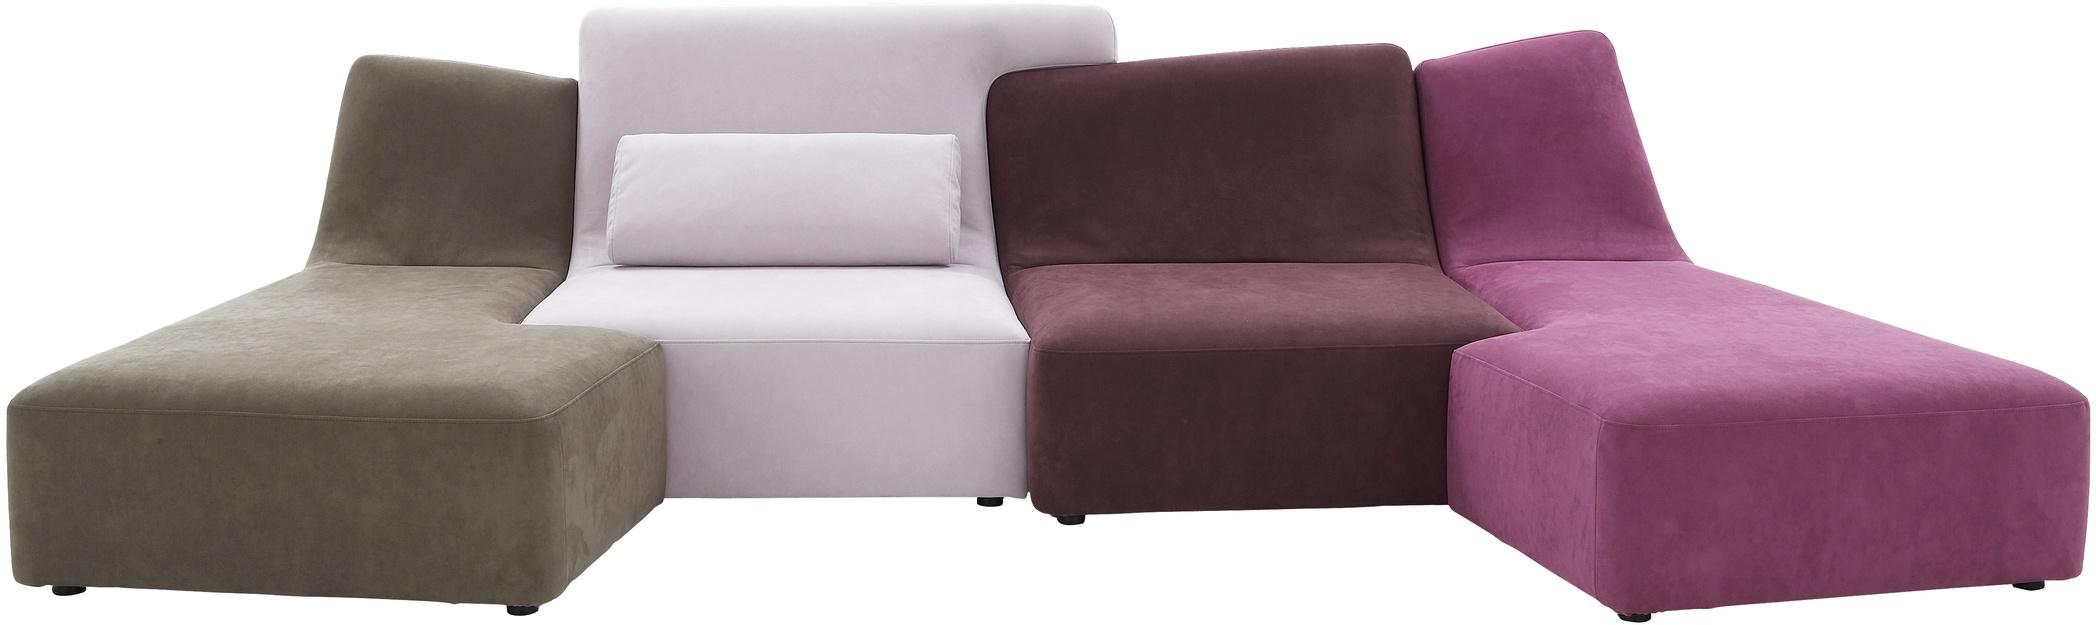 confluences, sofas designer : philippe nigro | ligne roset, Wohnzimmer dekoo